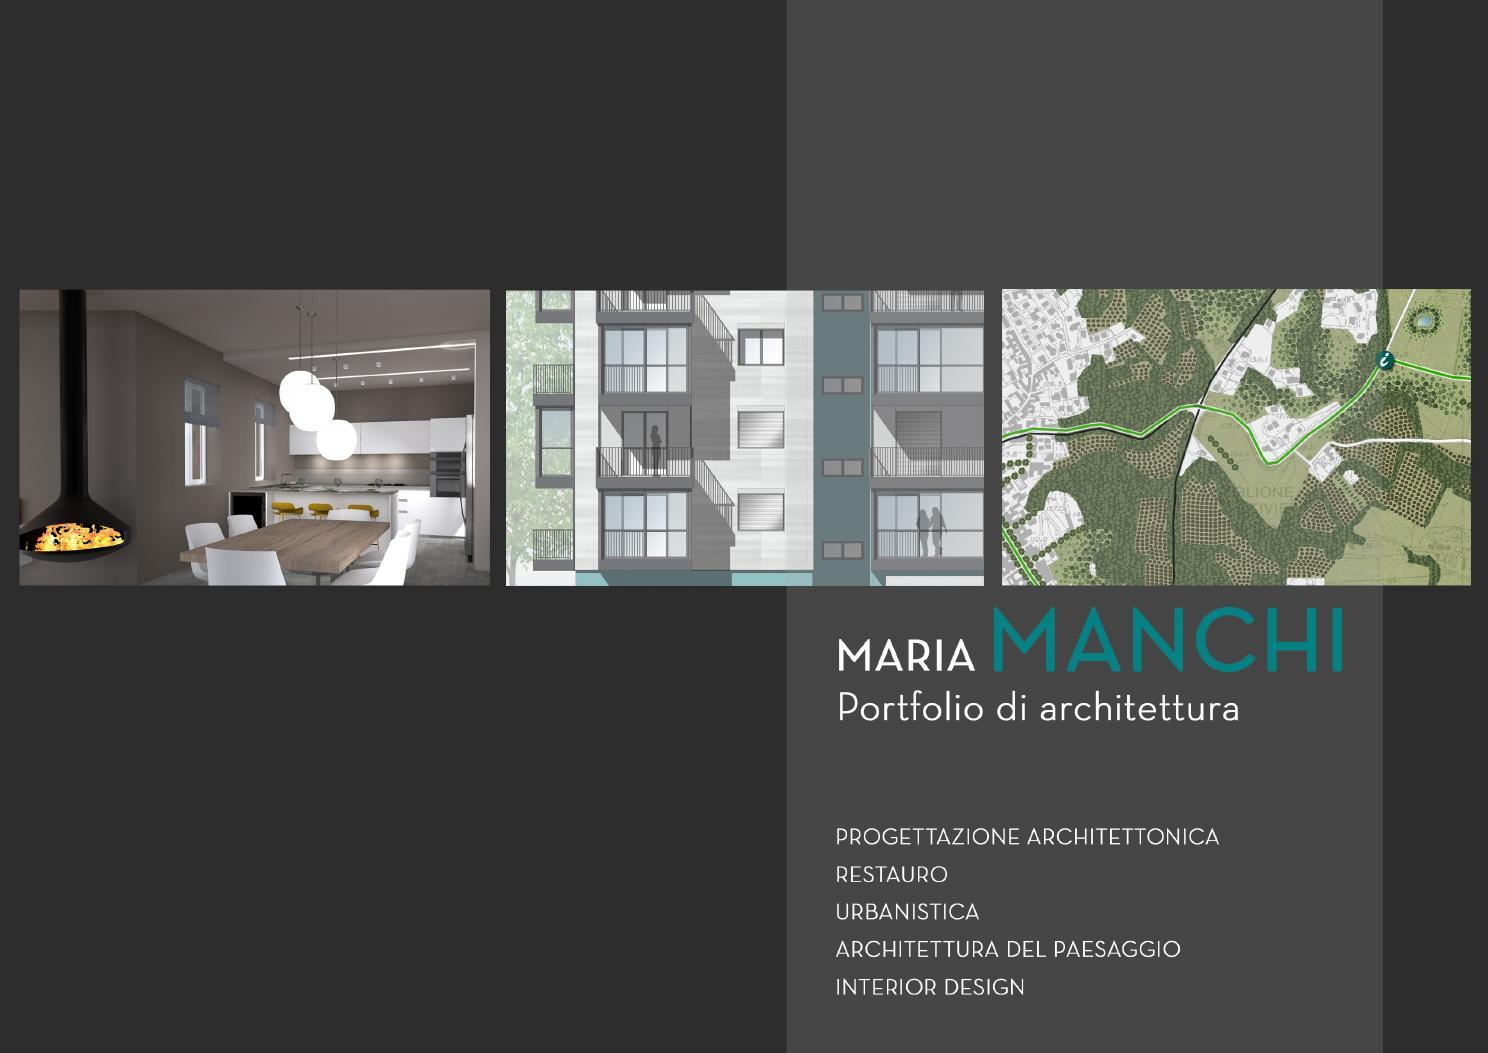 Maria Manchi Portfolio di Architettura by Maria Manchi - issuu